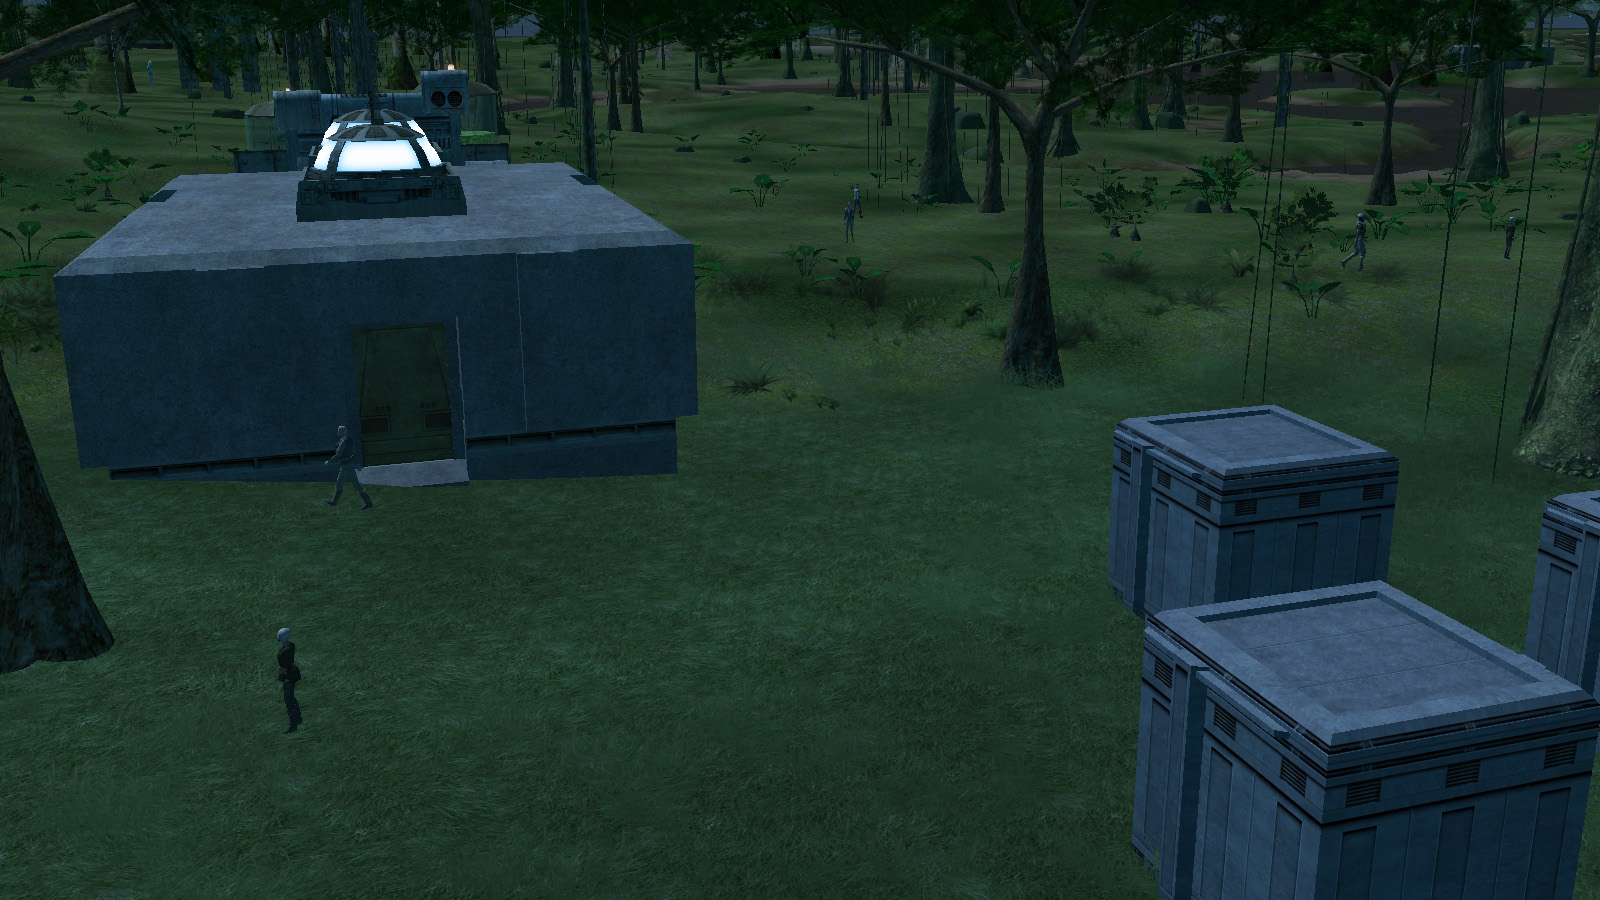 Skaak Tipper Bunker